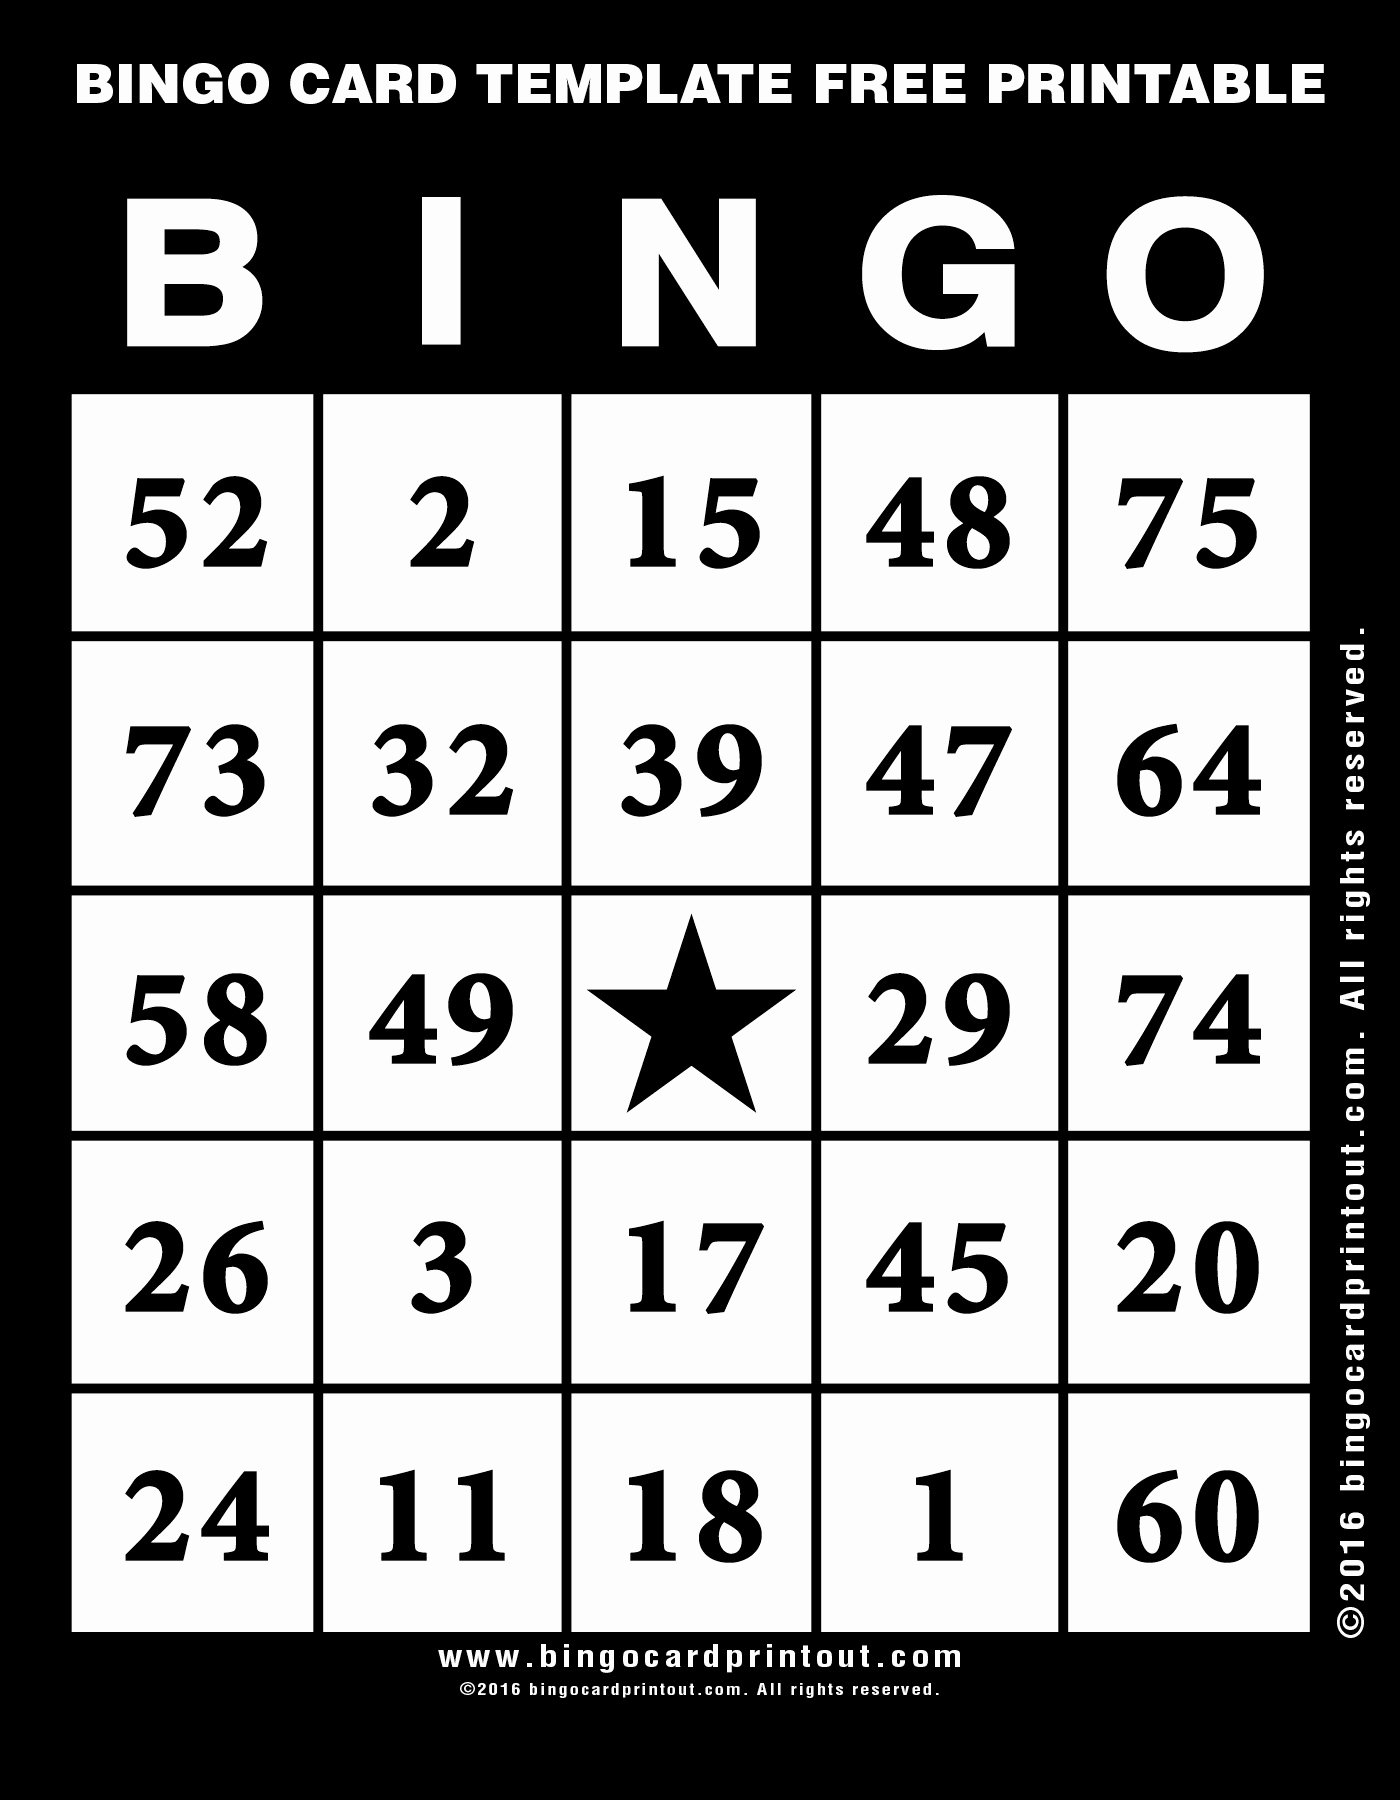 Bingo Card Template Free Printable Bingocardprintout